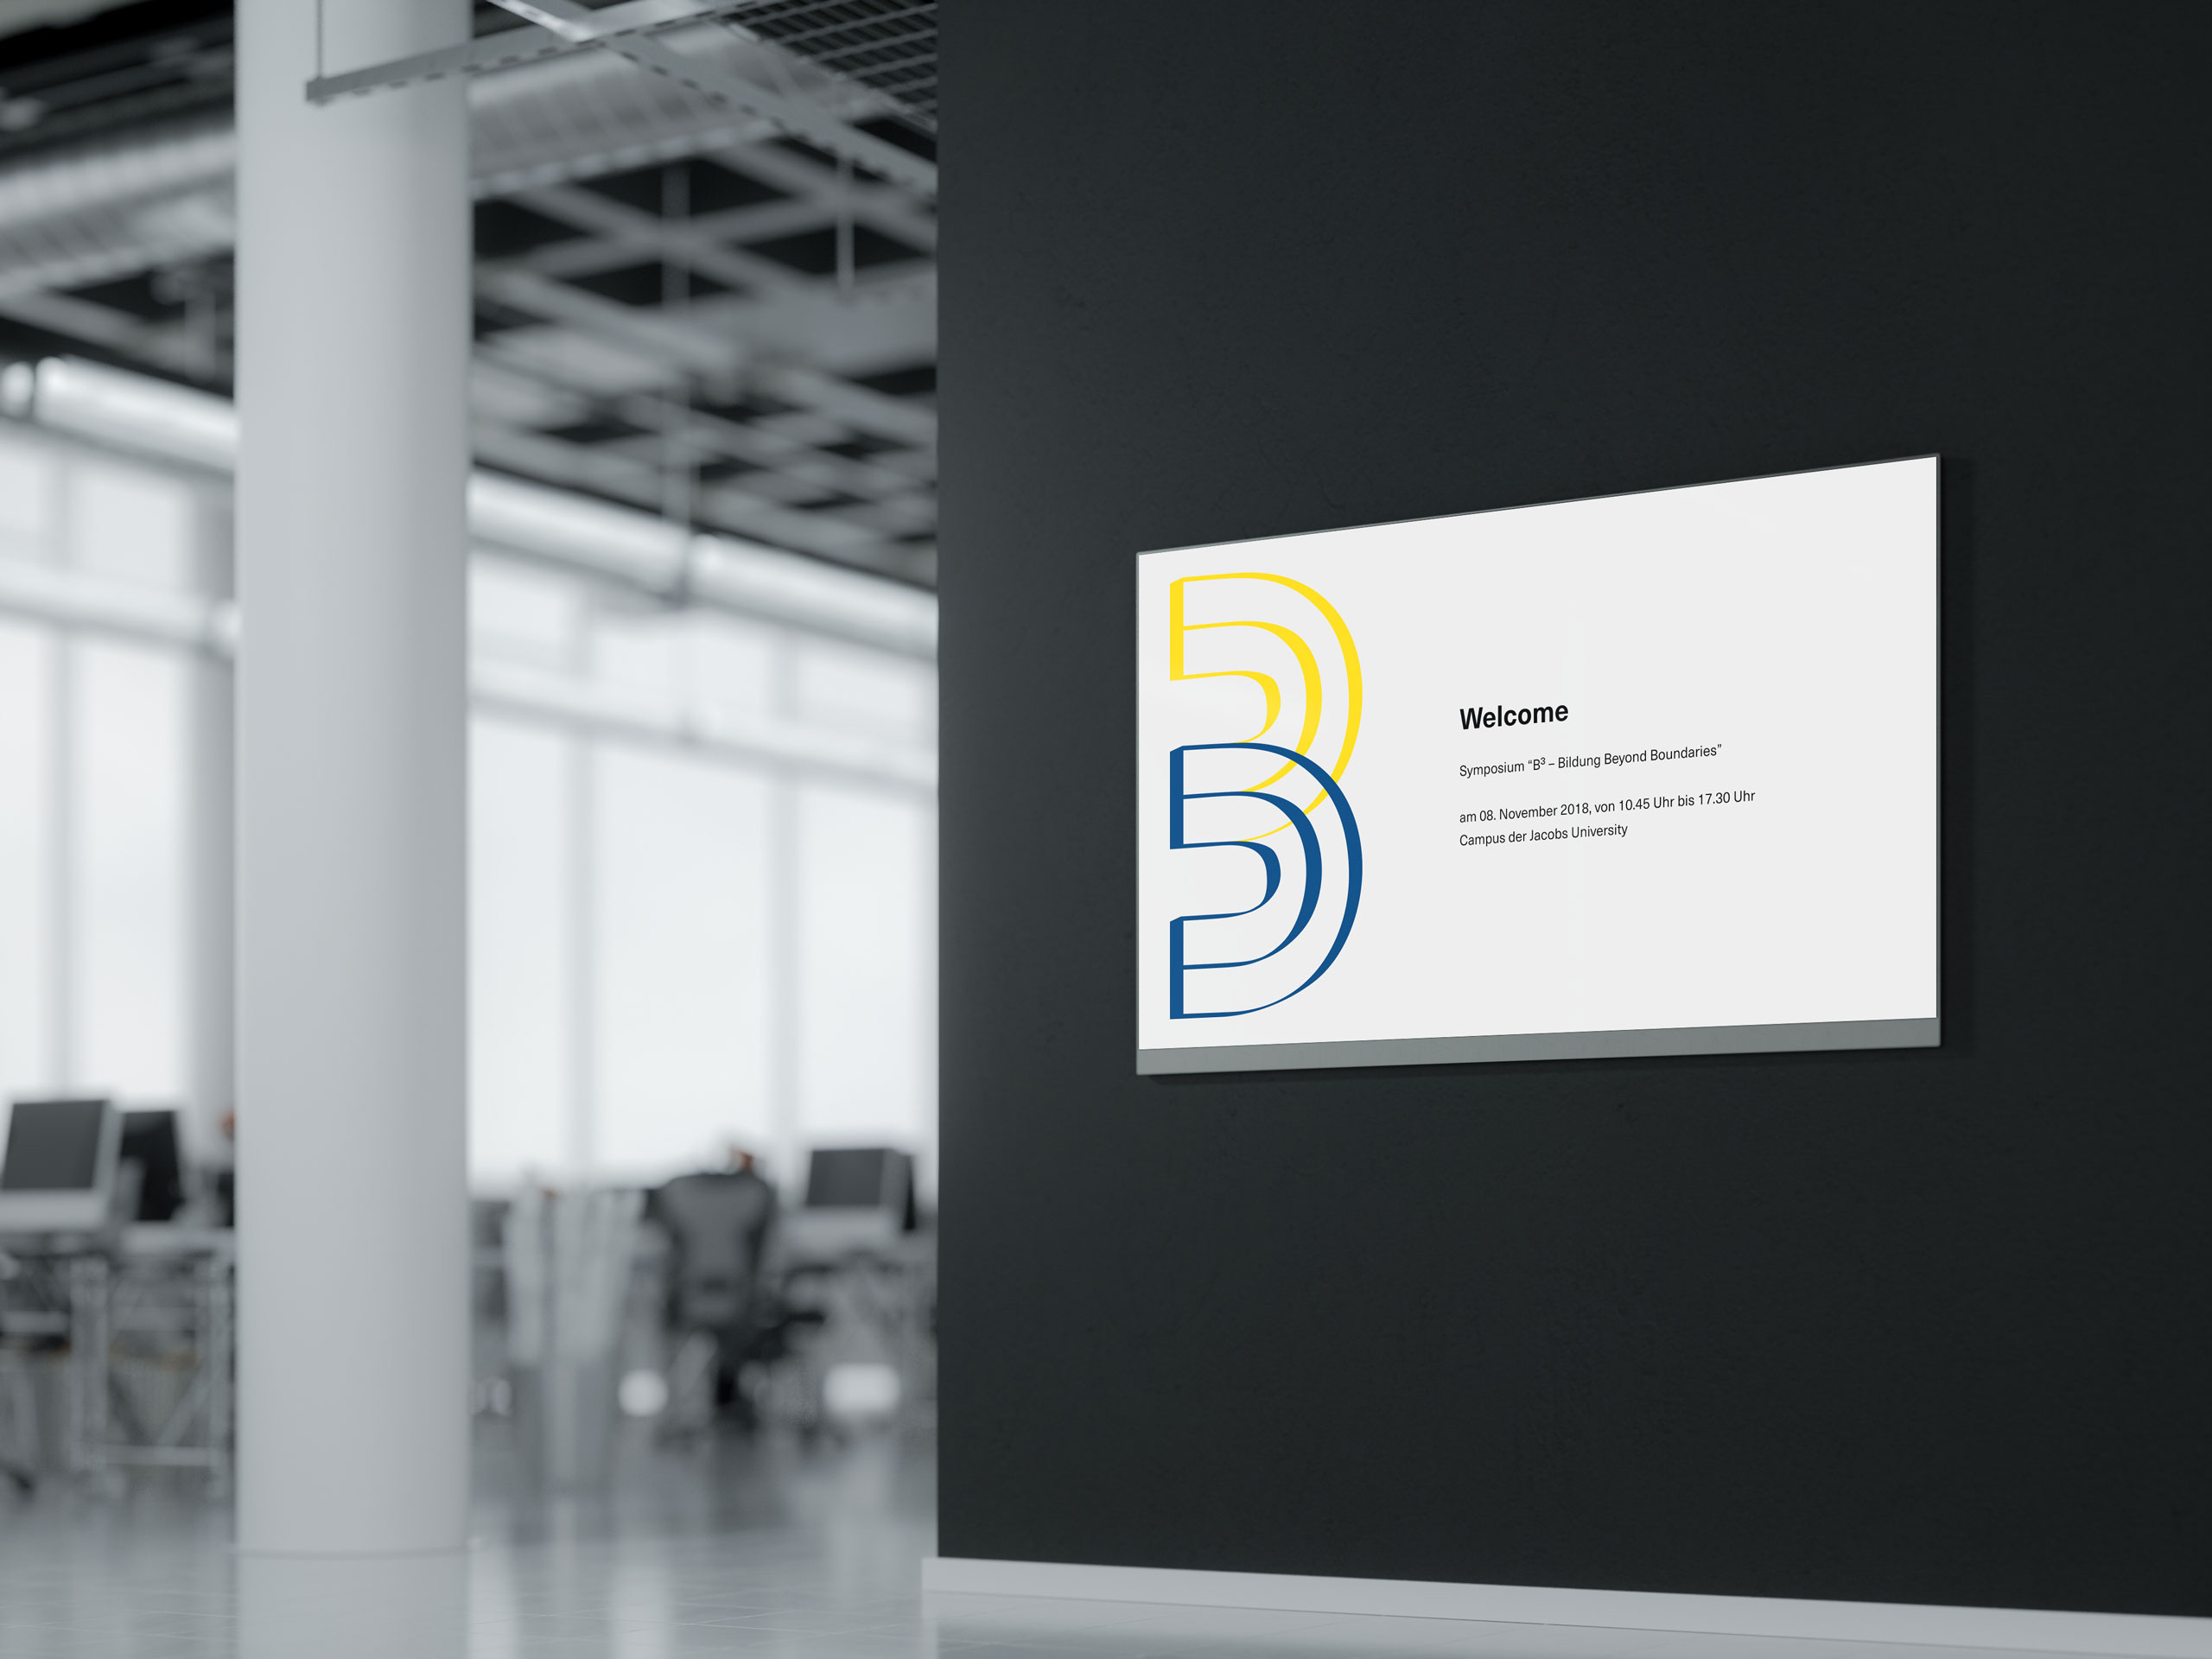 Symposium-B3-Bildung-Beyond-Boundaries03